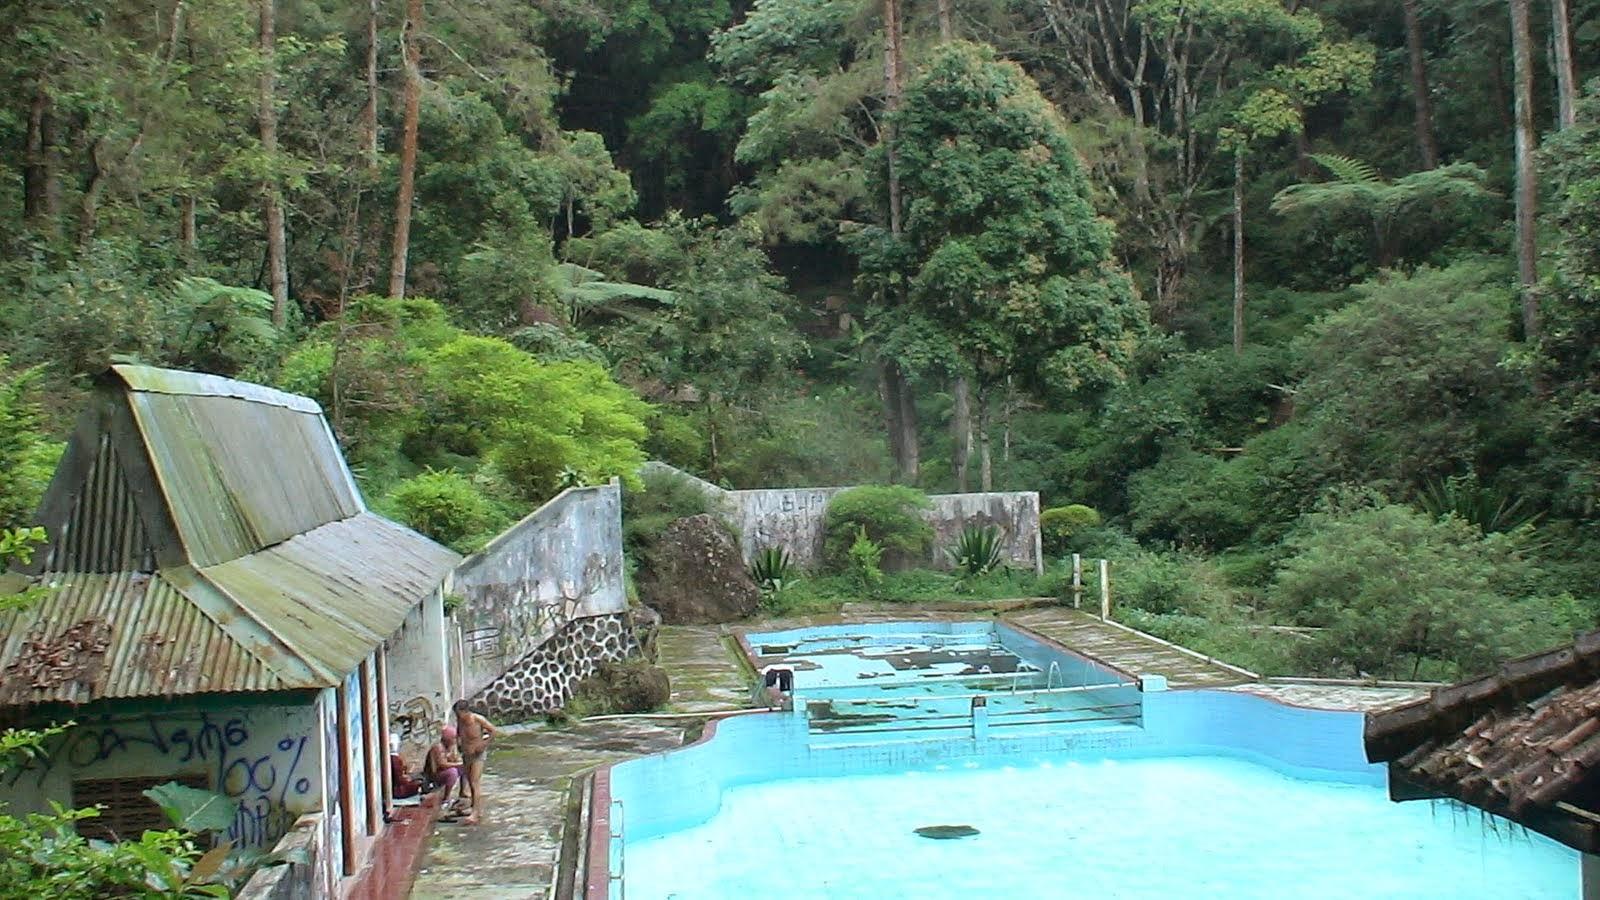 Menikmati Keindahan Taman Wisata Kopeng Pesona Wisata Indonesia